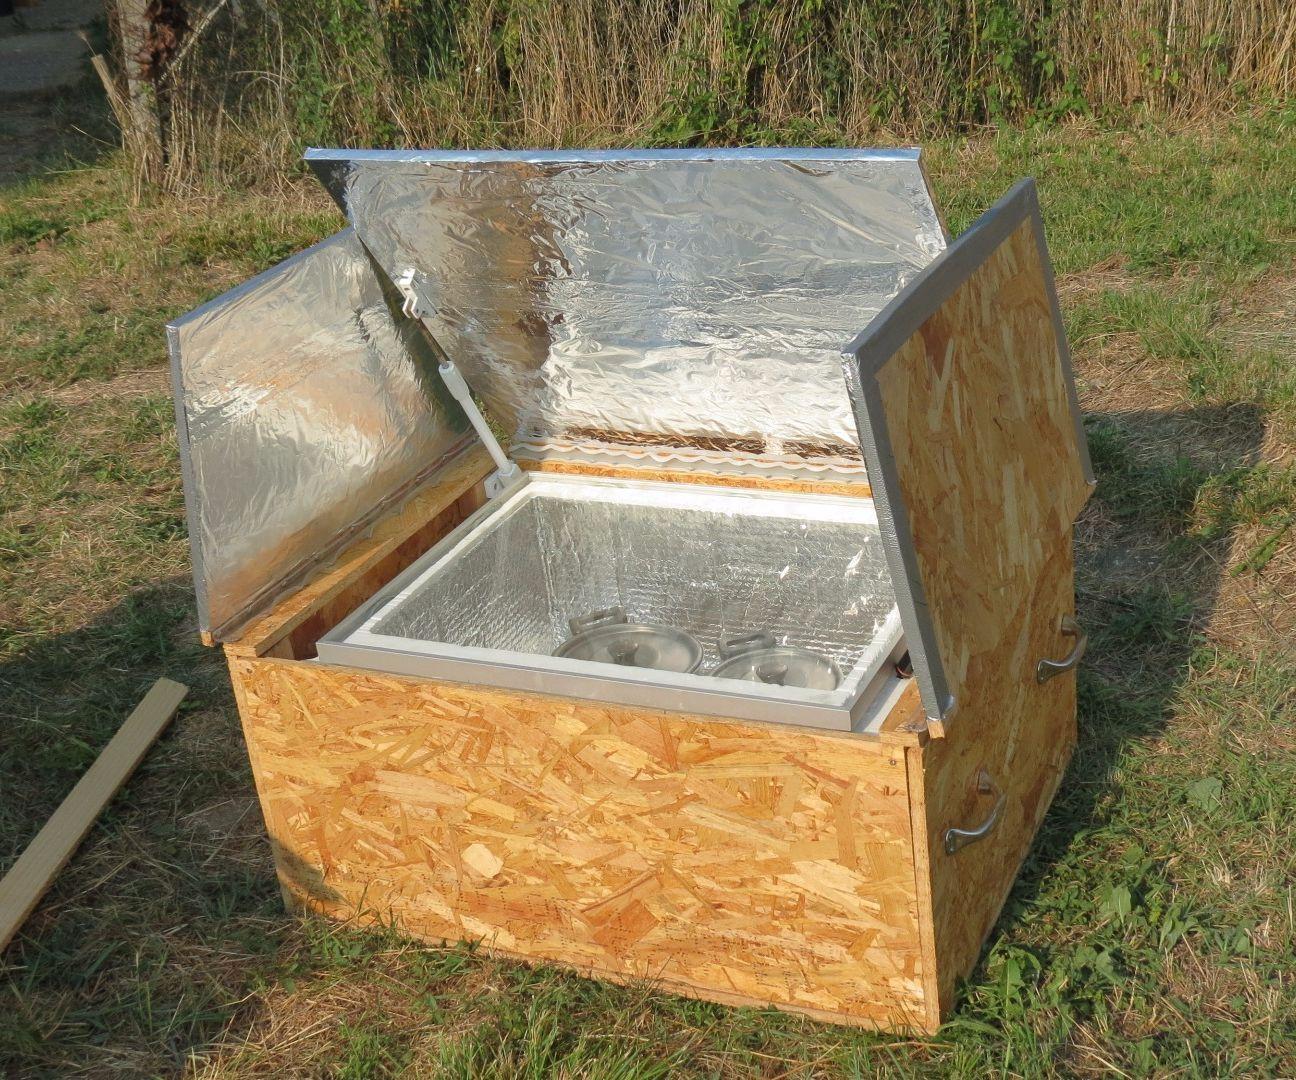 Diy Solar Oven Solar Oven Diy Solar Oven Solar Cooking